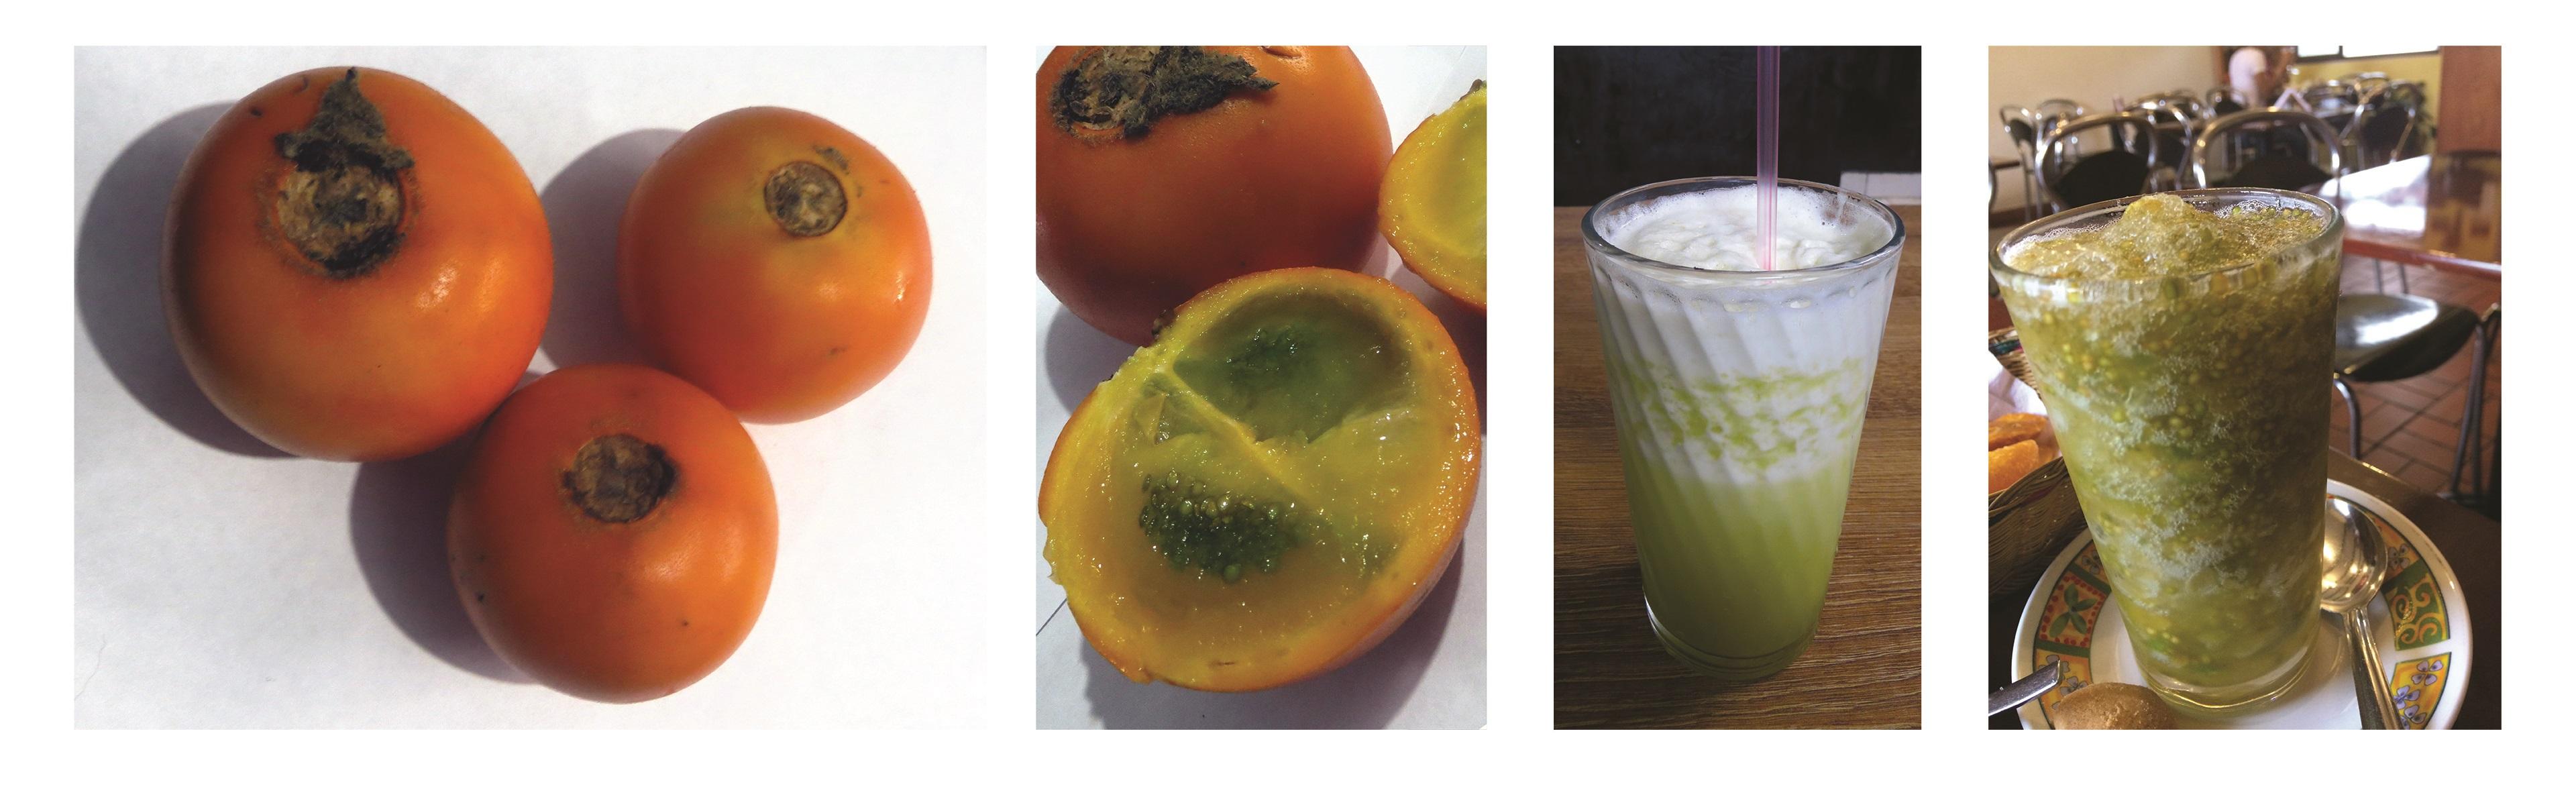 Lulos Colombian Fruit Juice